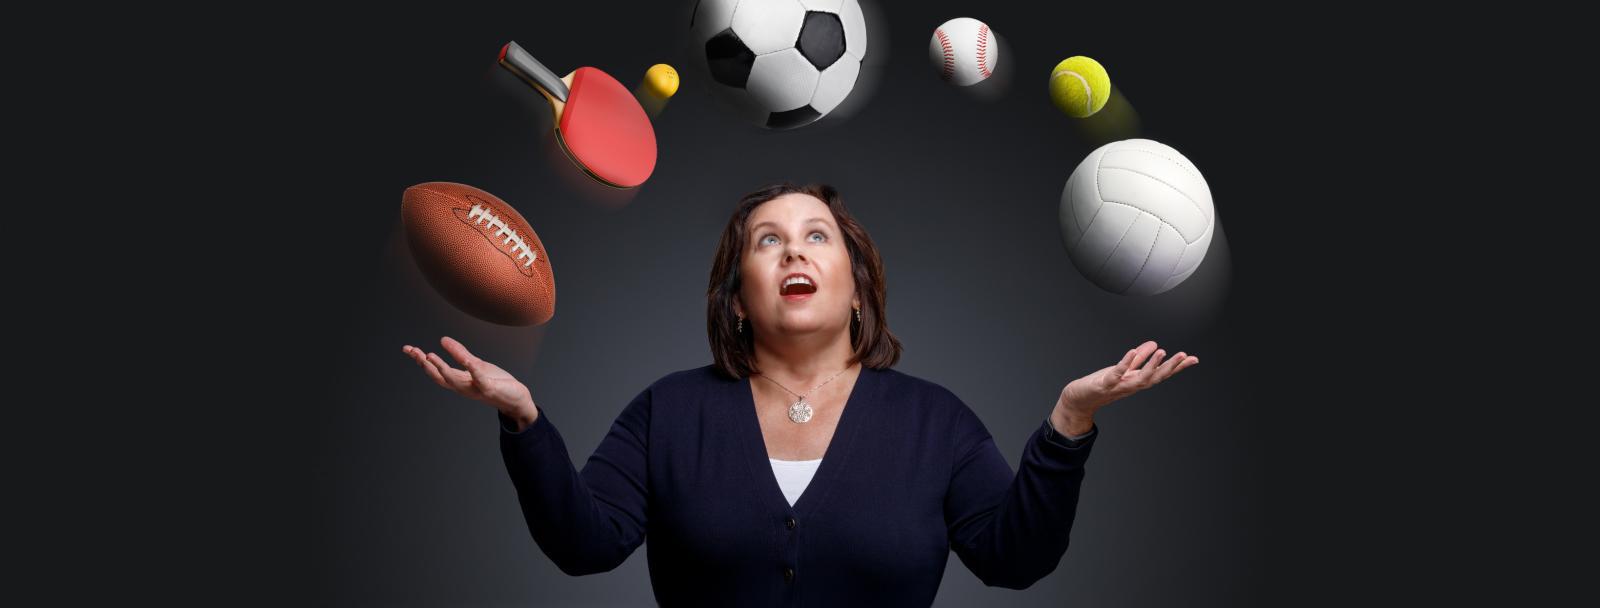 Amy Sports